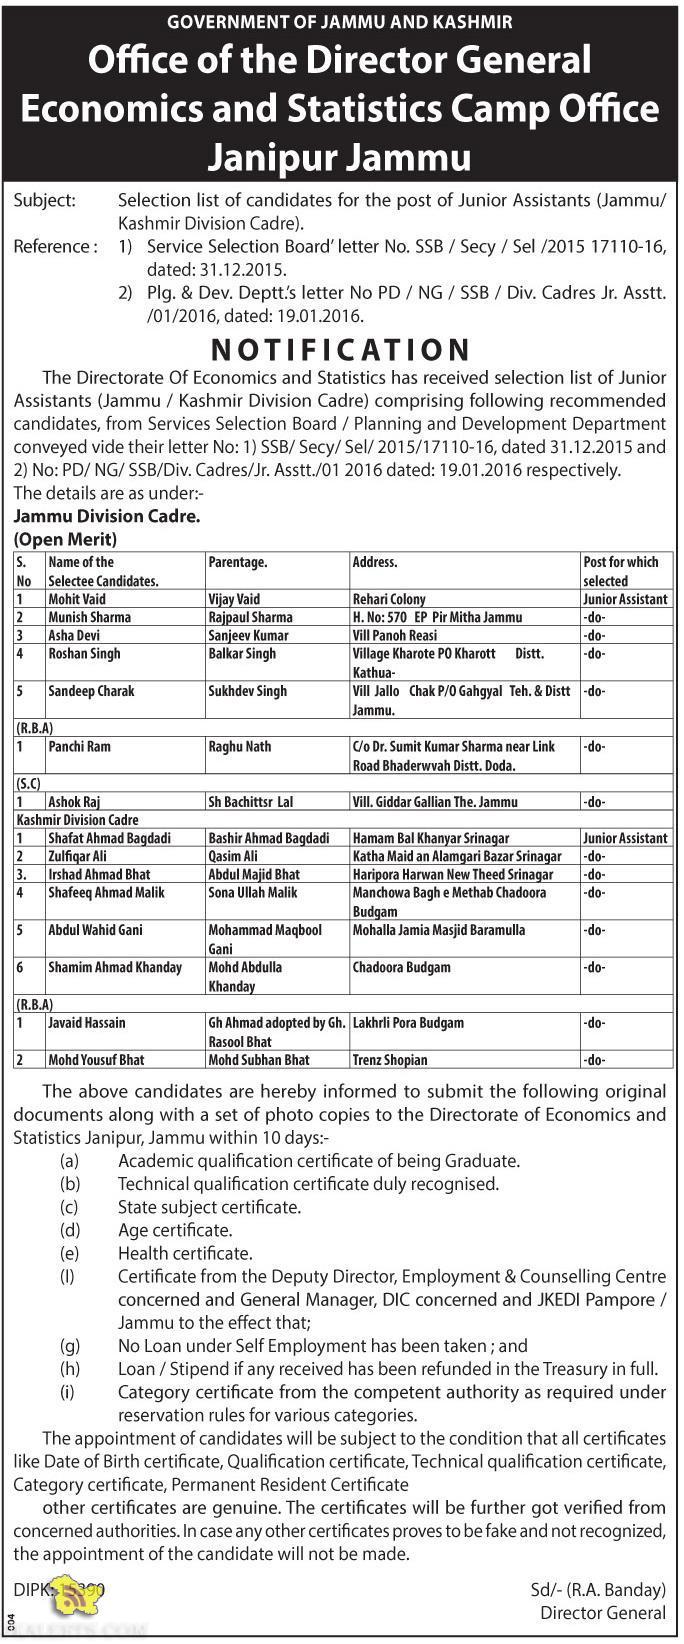 JKSSB Selection list of candidates for the post of Junior Assistants (Jammu/ Kashmir Division Cadre).